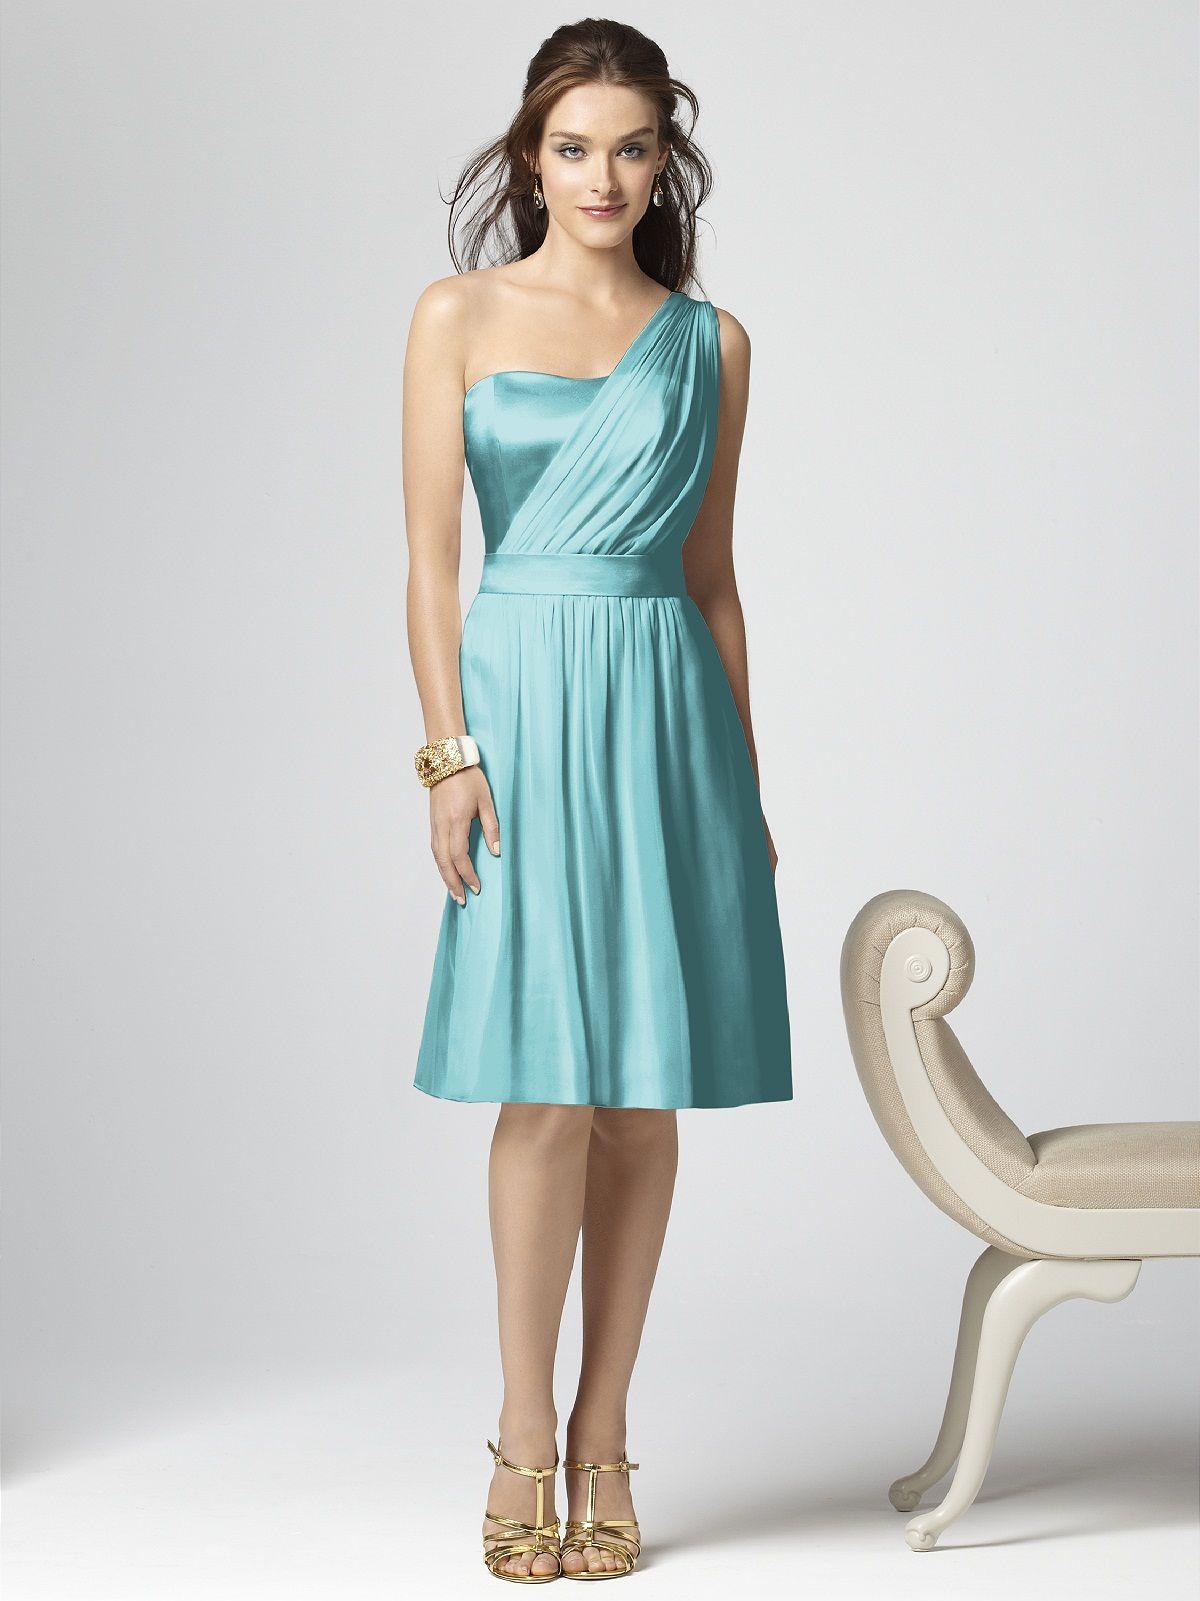 Modern Debenhams Bridesmaid Dresses Uk Pictures - All Wedding ...